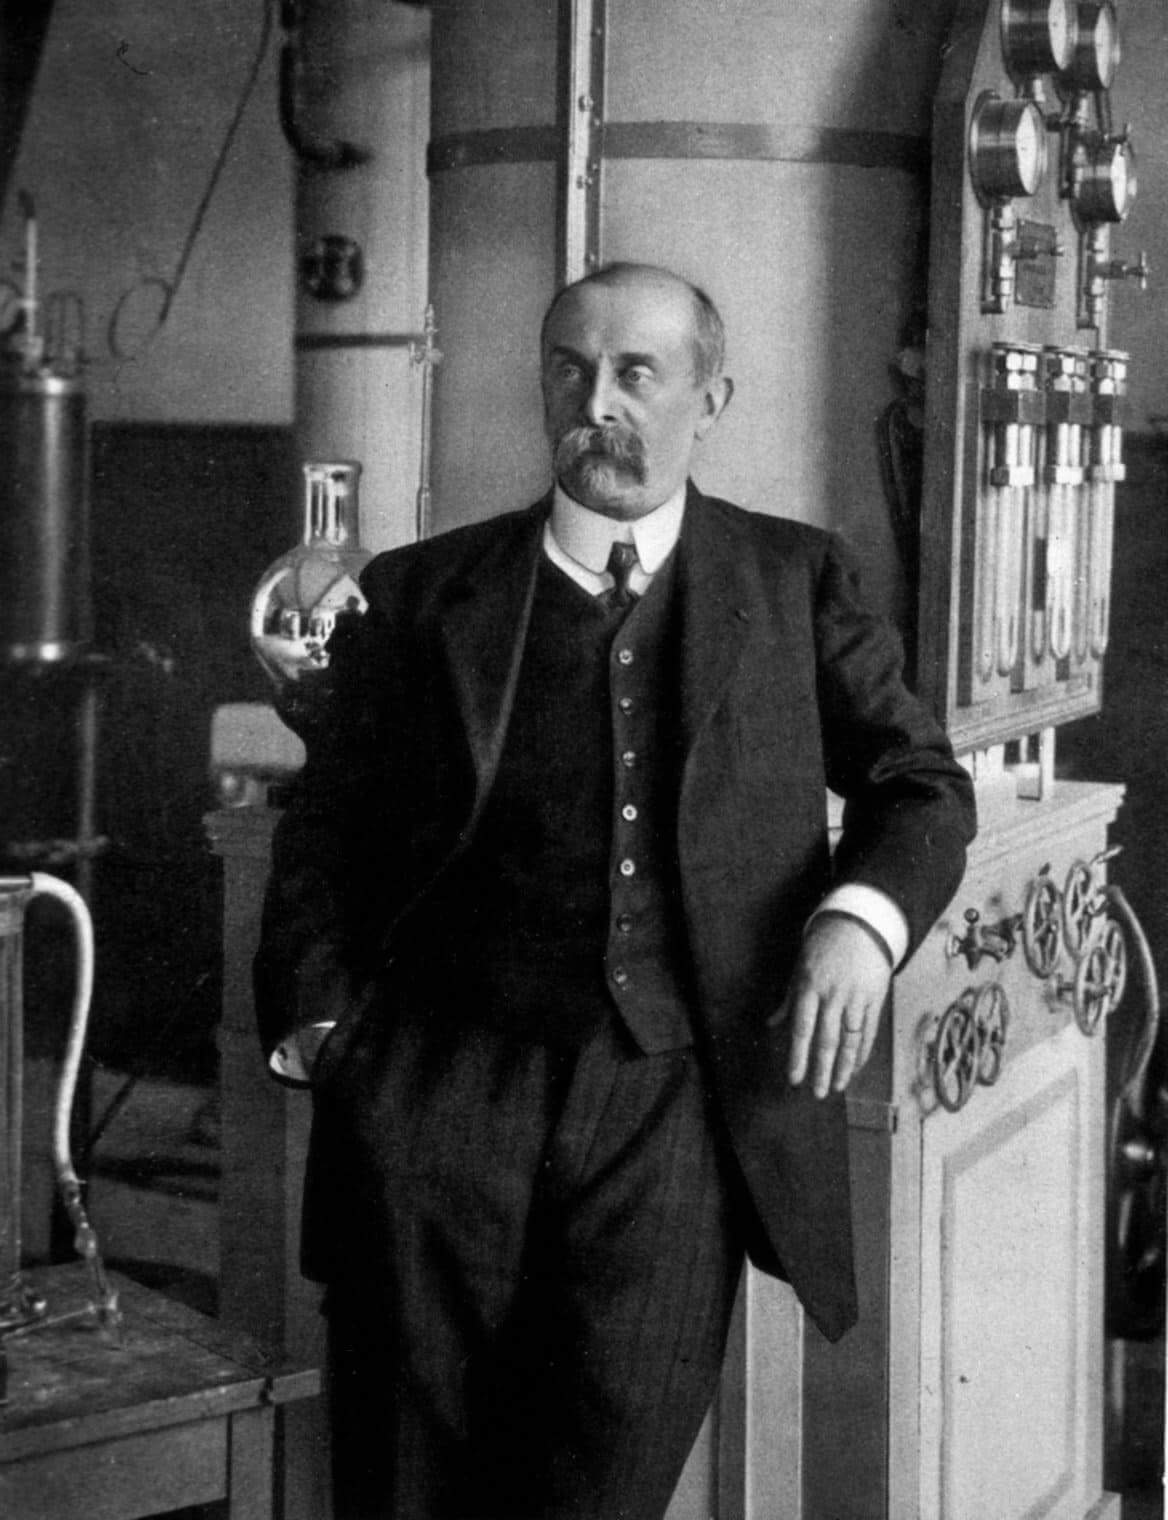 А. д'Арсонваль - французский физик и физиолог